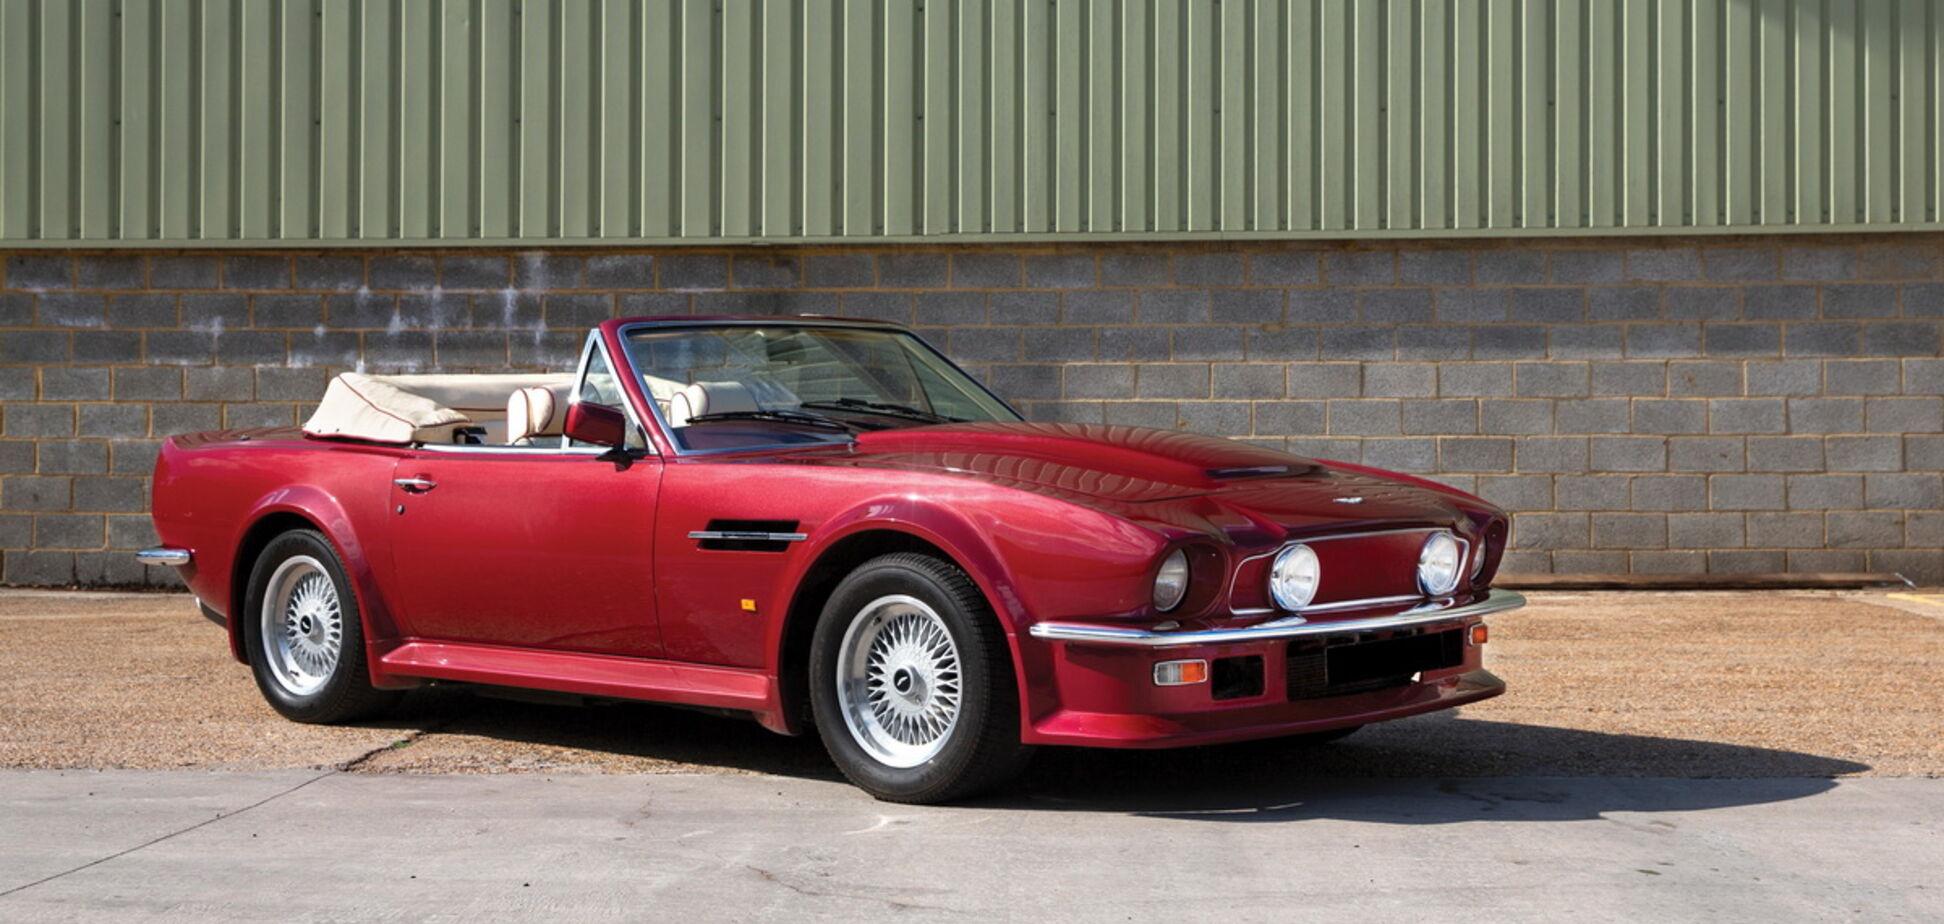 Aston Martin Дэвида Бэкхэма выставили на продажу